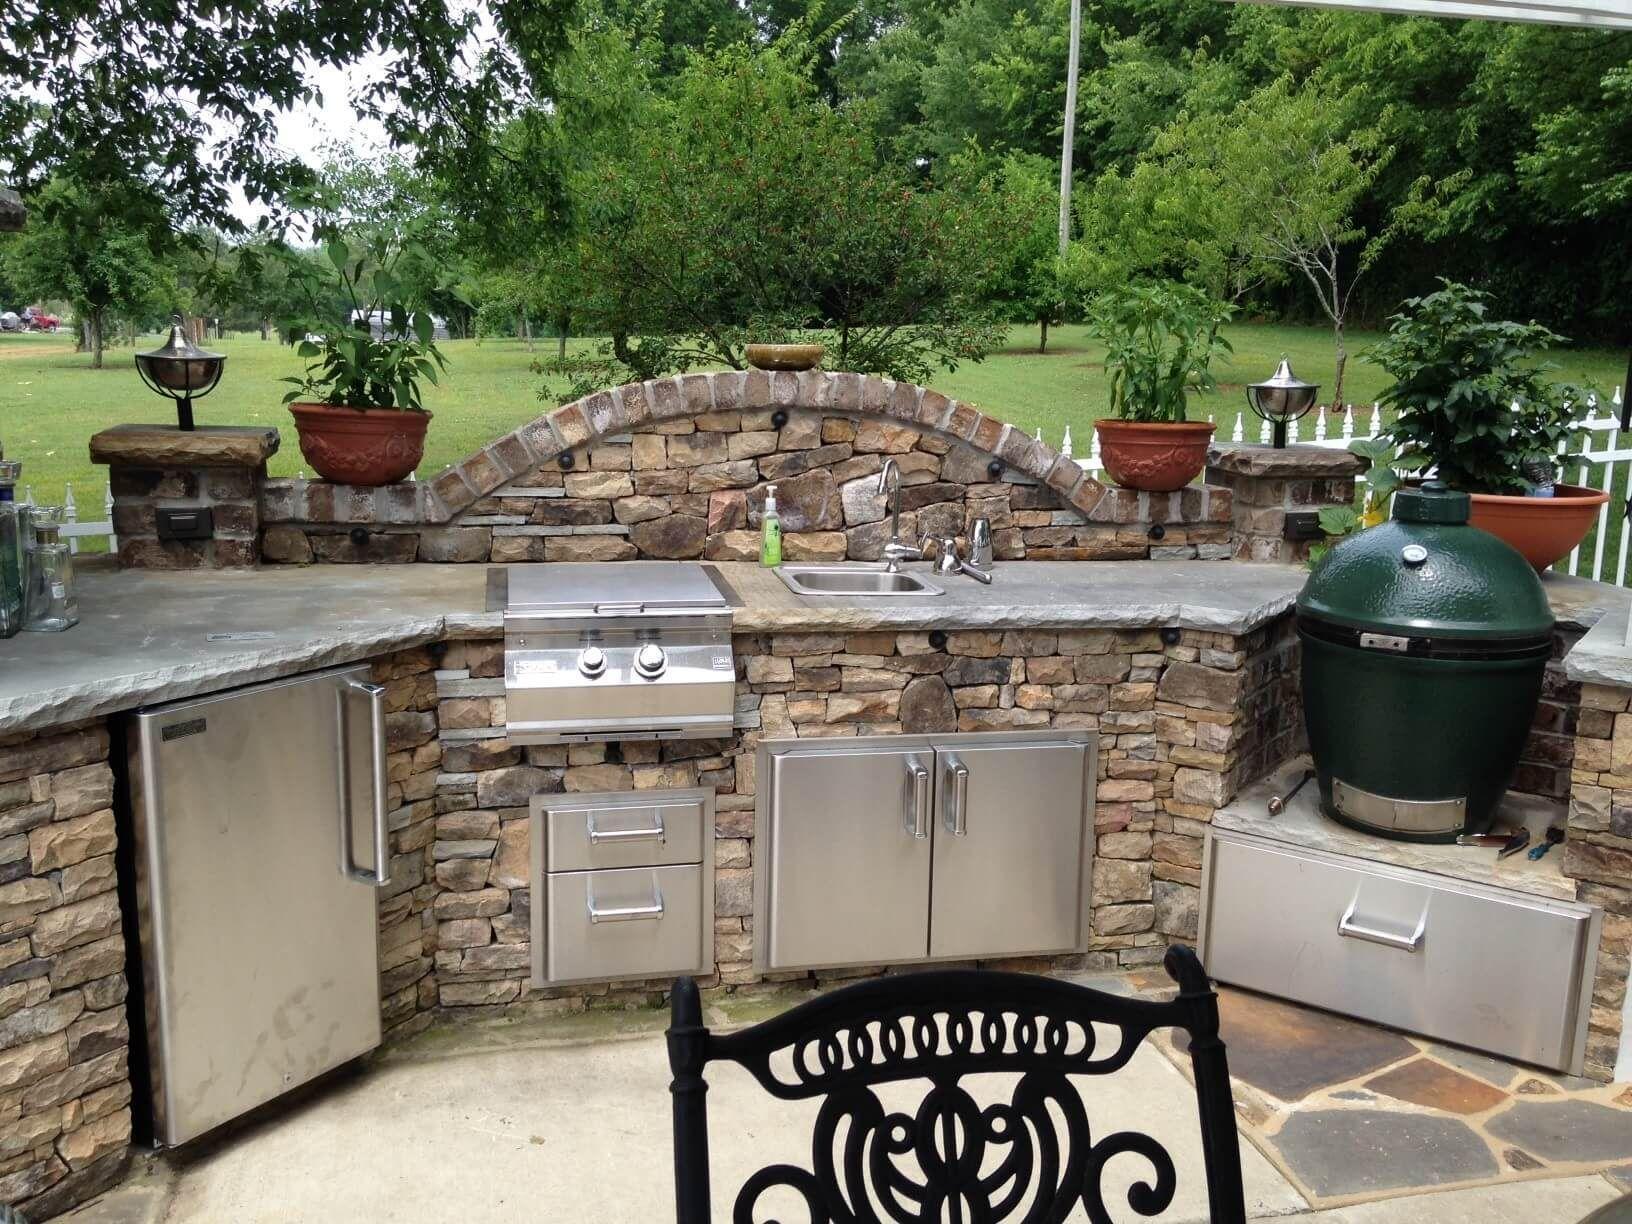 25 Incredible Outdoor Kitchen Ideas Outdoor Kitchen Decor Big Green Egg Outdoor Kitchen Outdoor Kitchen Appliances